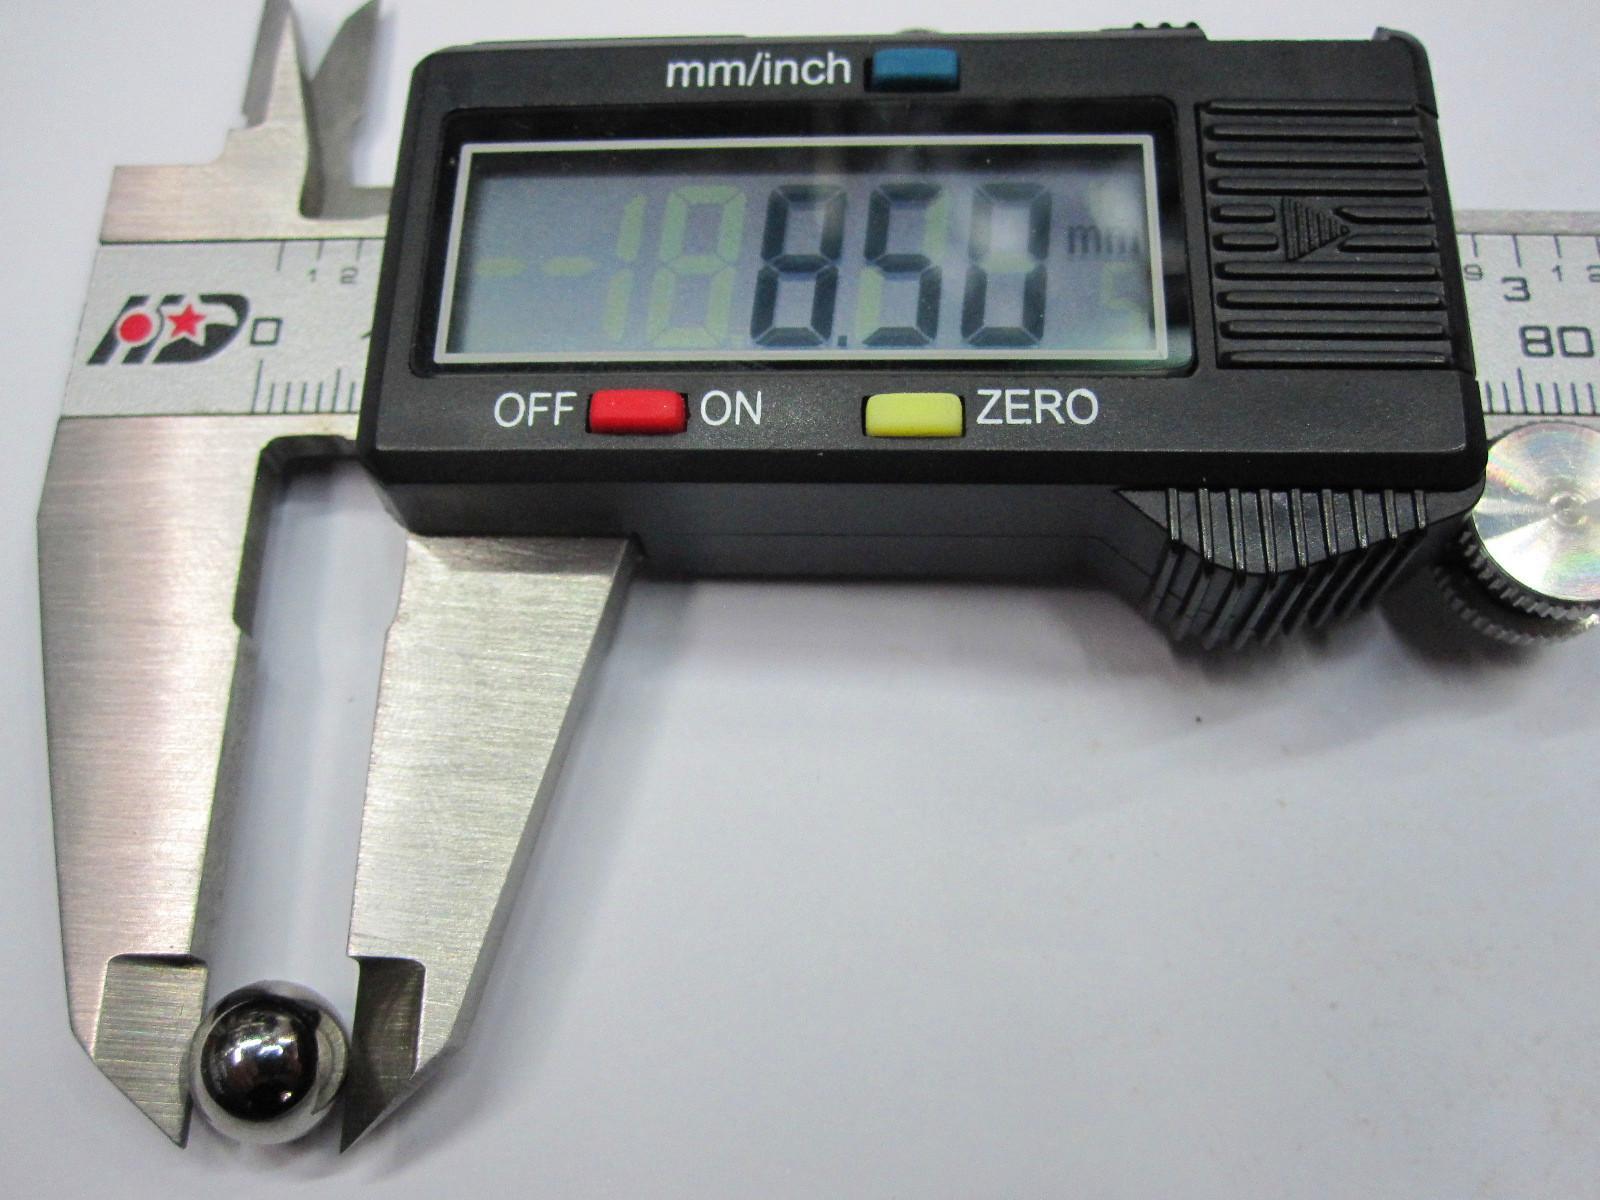 8,5 8.5 mm Rodamiento de bolas Bola de acero Diámetro de bola 8.5mm / set Precisión: G10-Grade 8.5mm